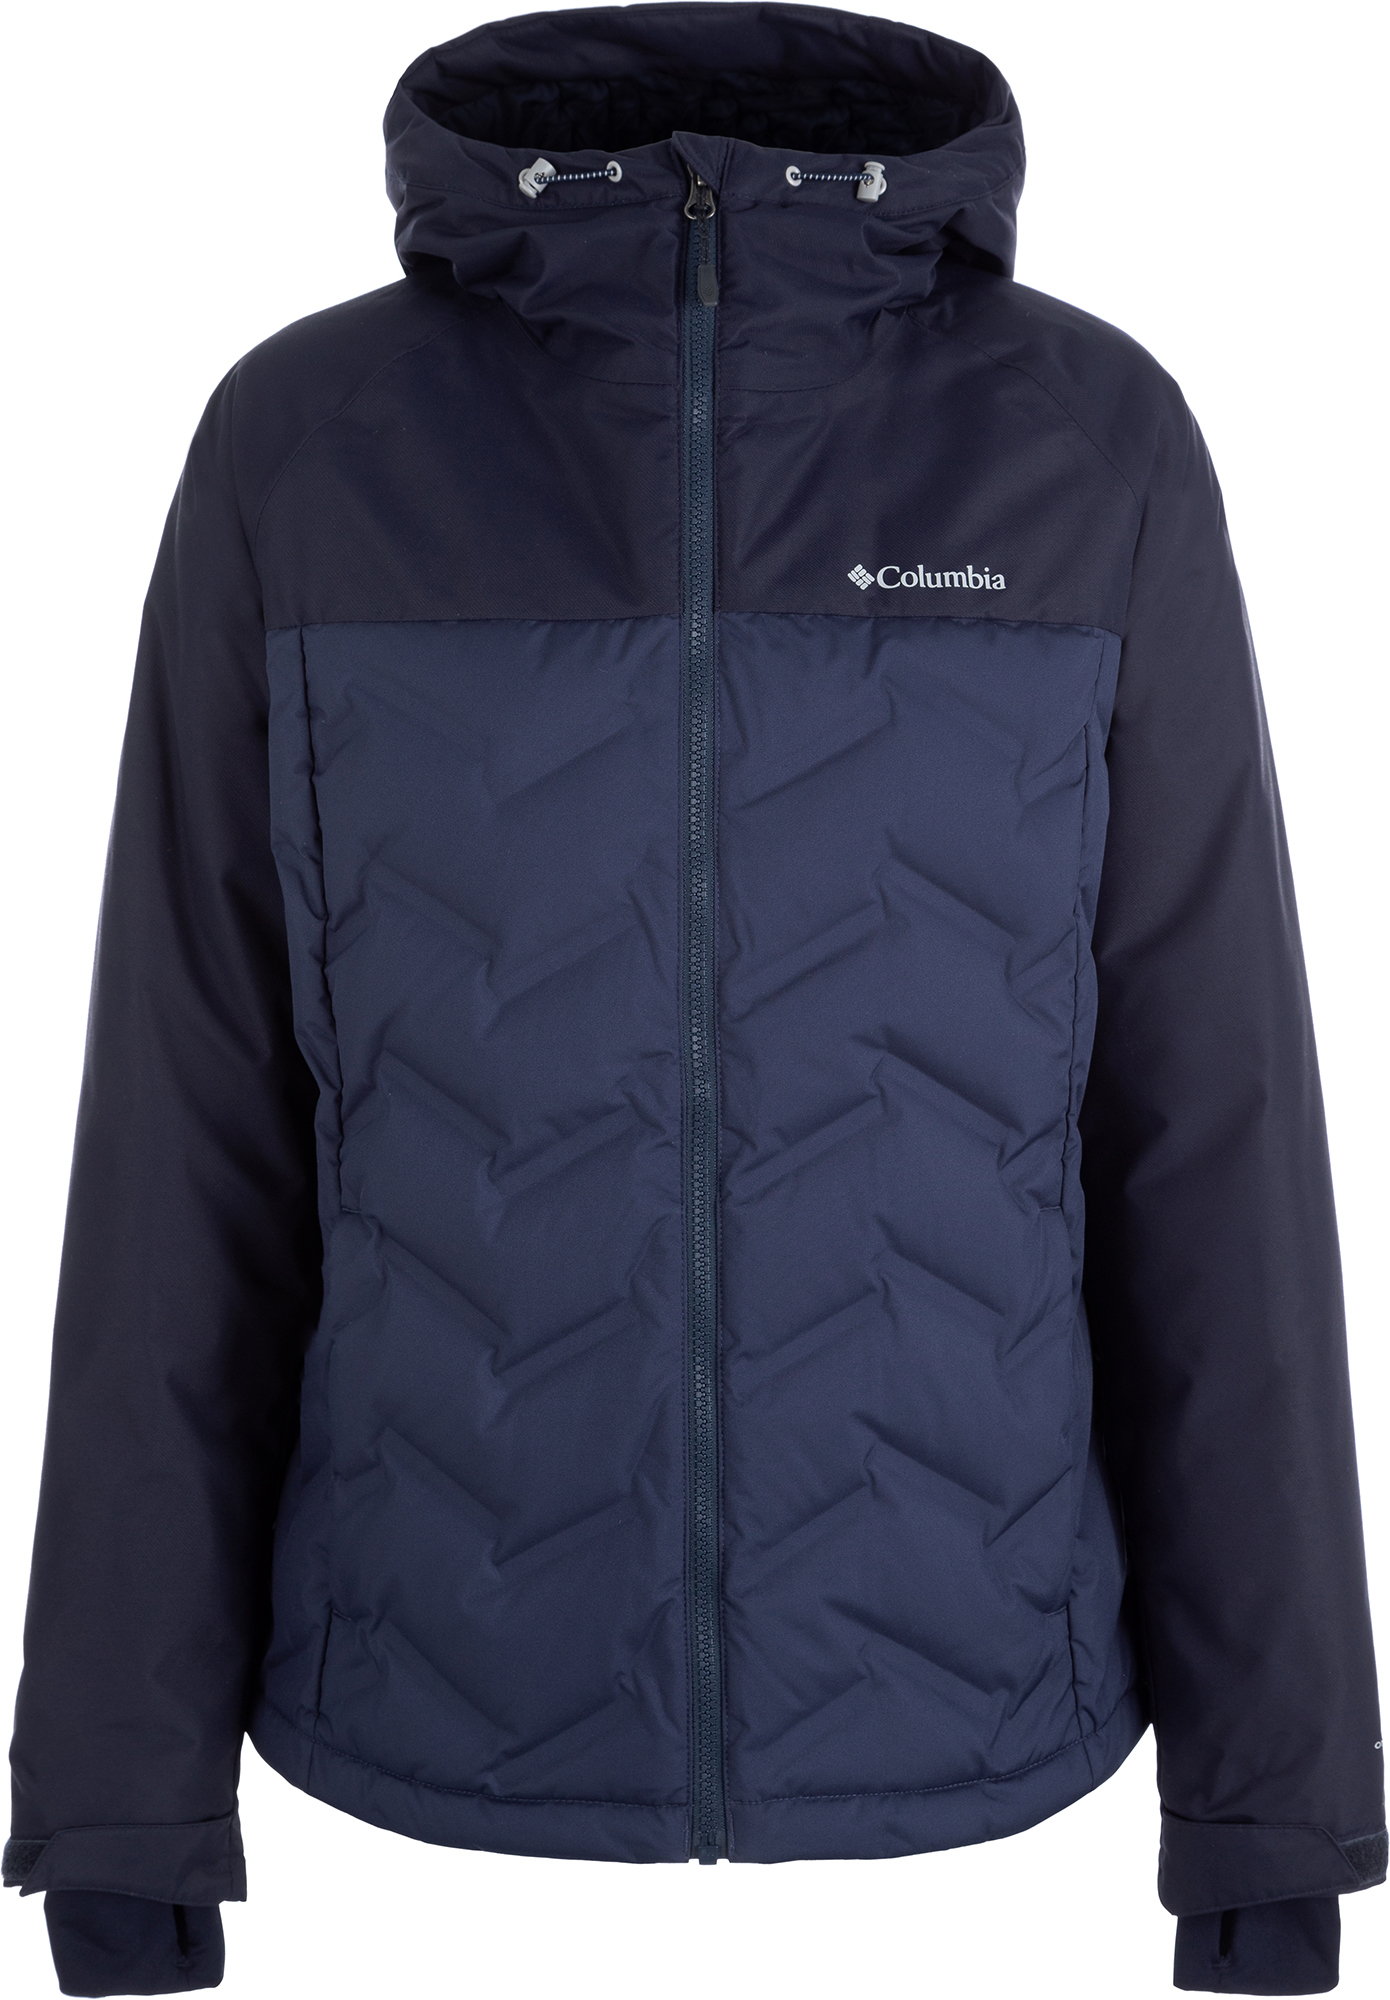 Columbia Куртка пуховая женская Columbia Grand Trek, размер 50